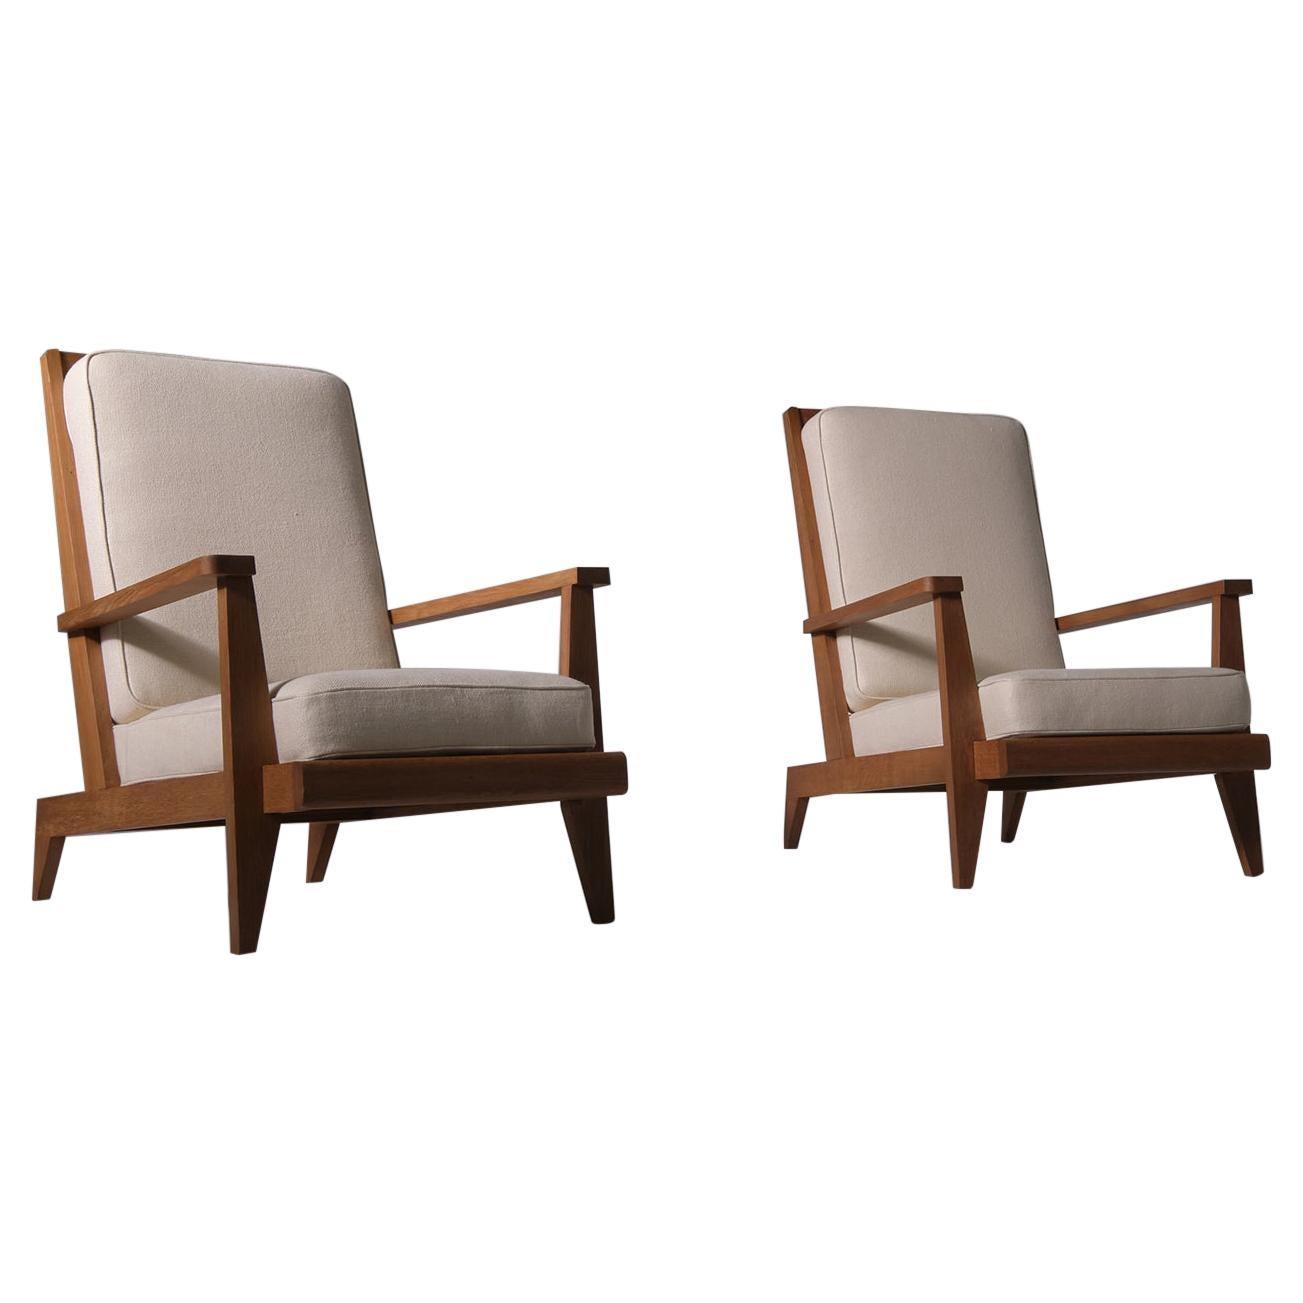 René Gabriel Lounge chairs in French Oak, France 1946